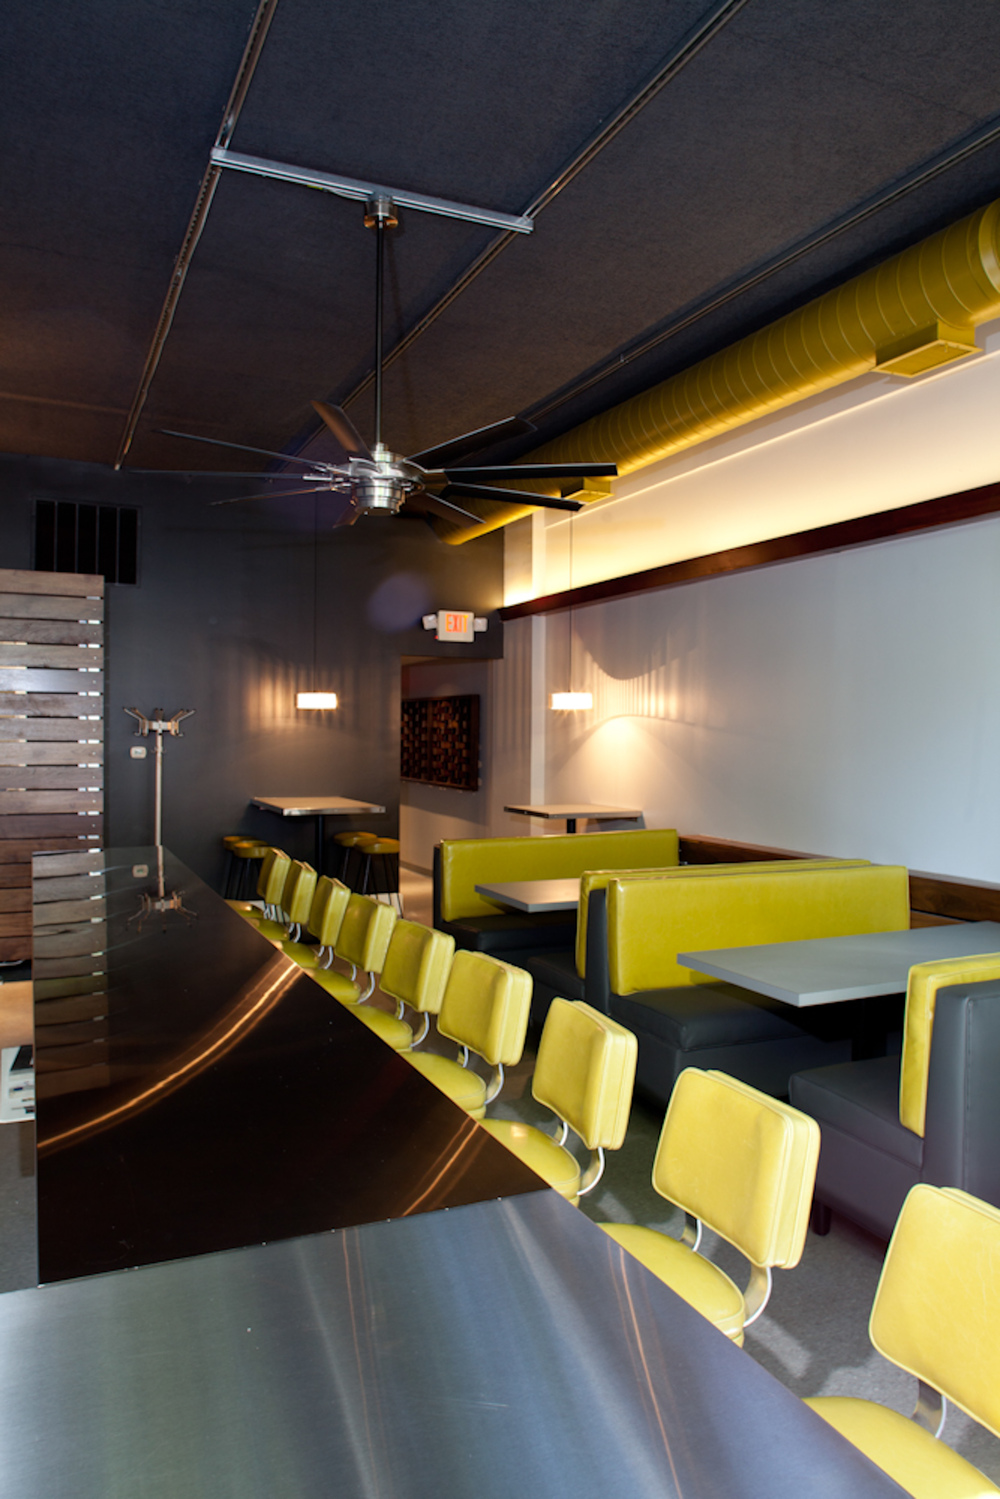 SC1475 - Tina Corbin - Philco Restaurant - 05-14-13-9.jpg